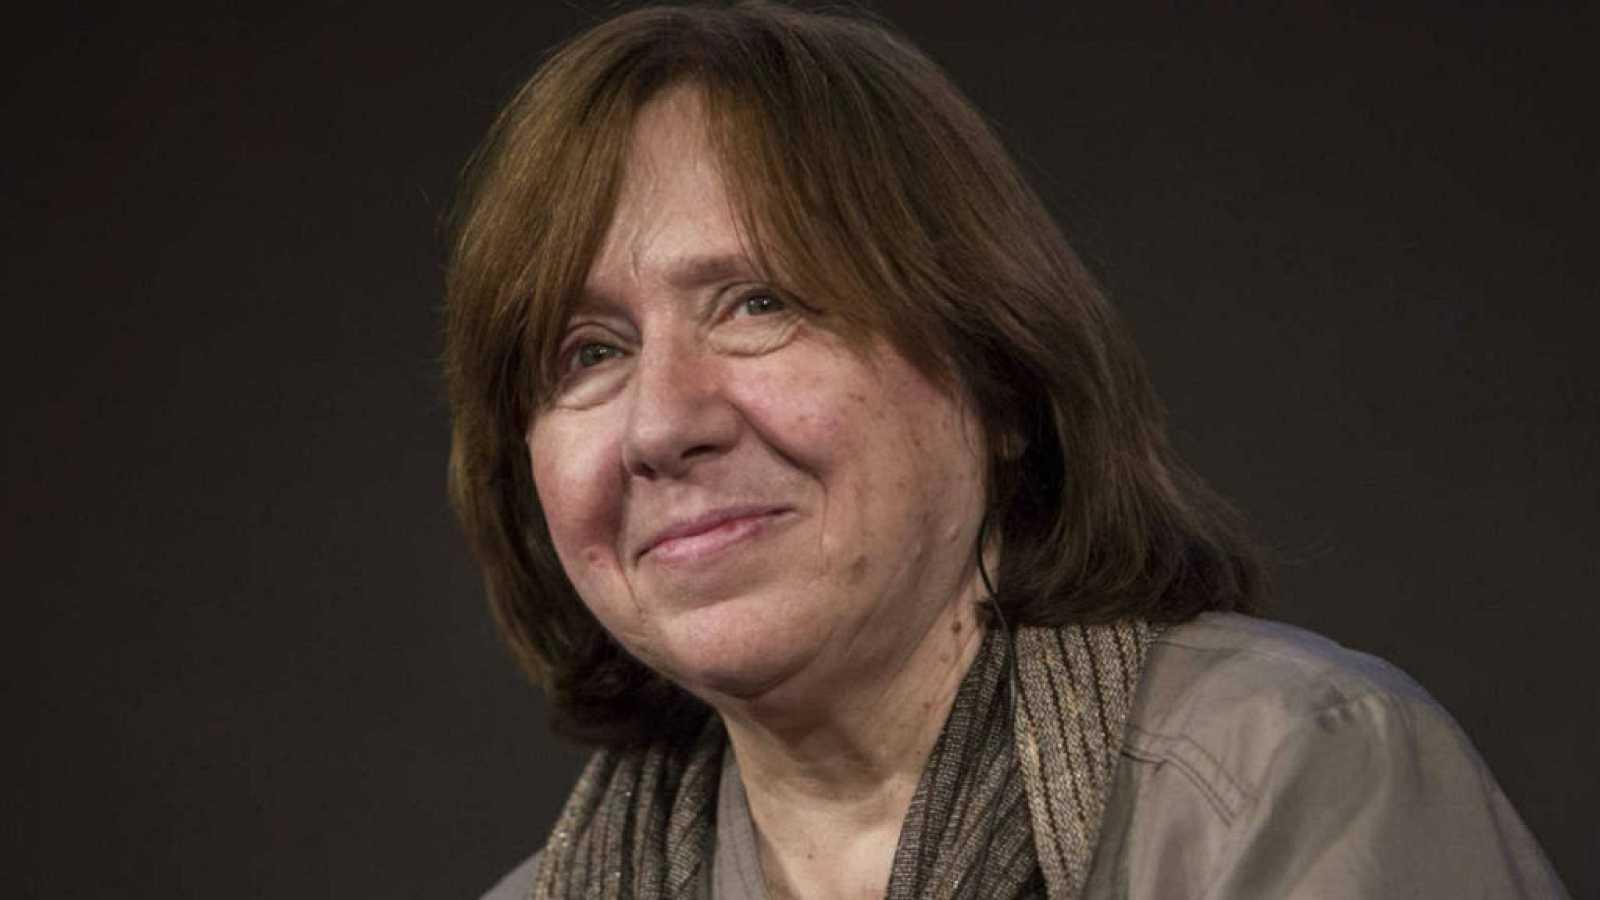 Efecto Doppler - Charla con Svetlana Alexievich - 30/09/19 - escuchar ahora